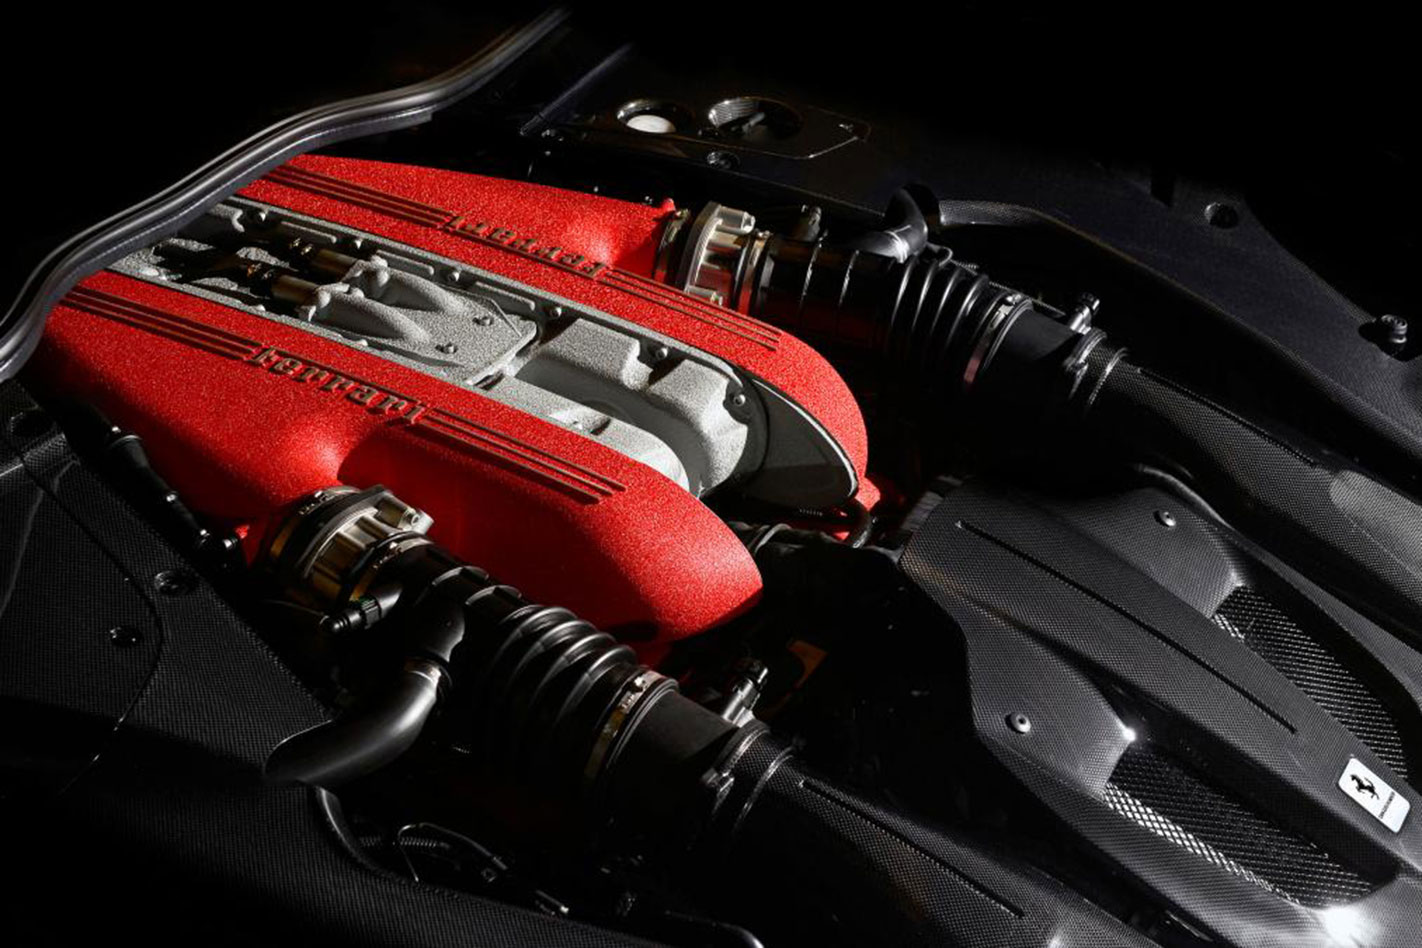 Ferrari -F12tdf -engine